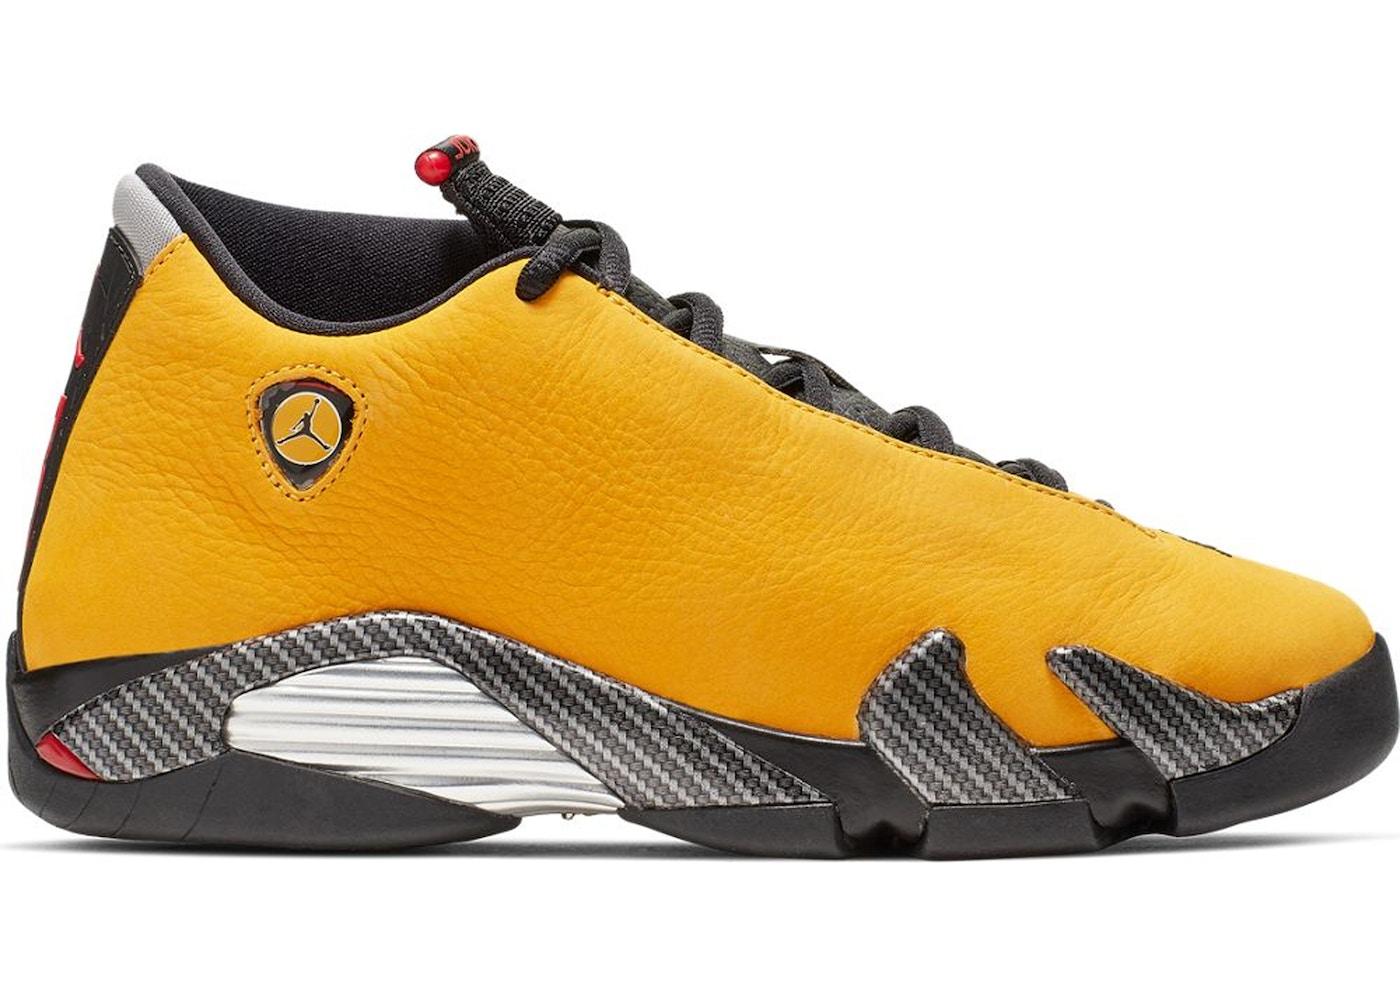 info for 2936b e2919 Buy Air Jordan 14 Shoes & Deadstock Sneakers